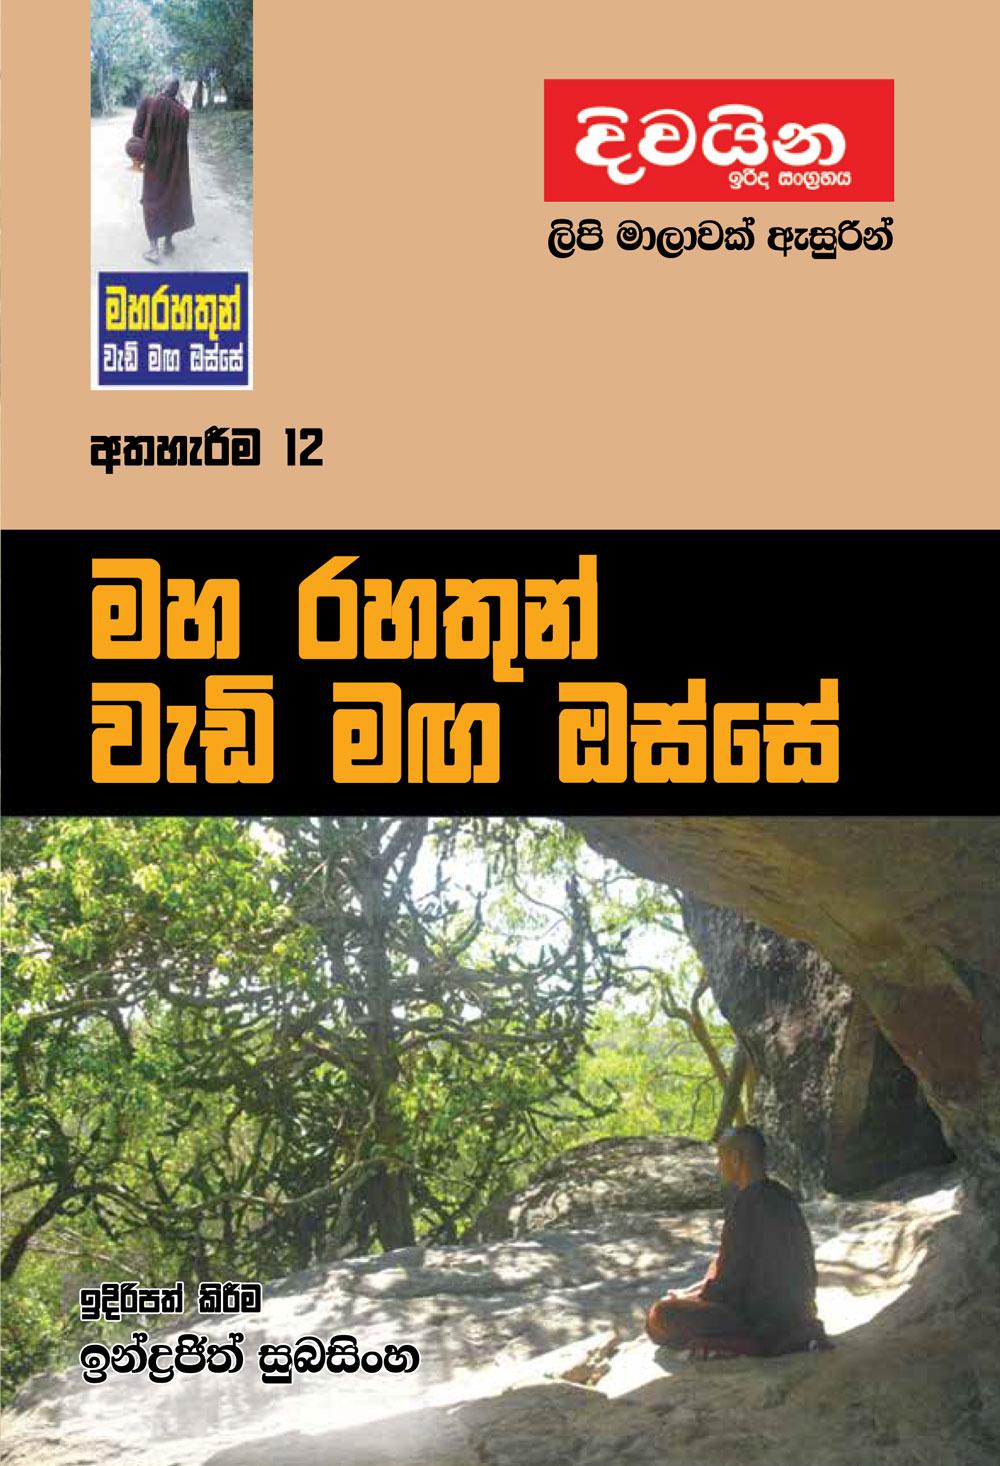 Maha Rahathun Wadi Maga Osse Book 12